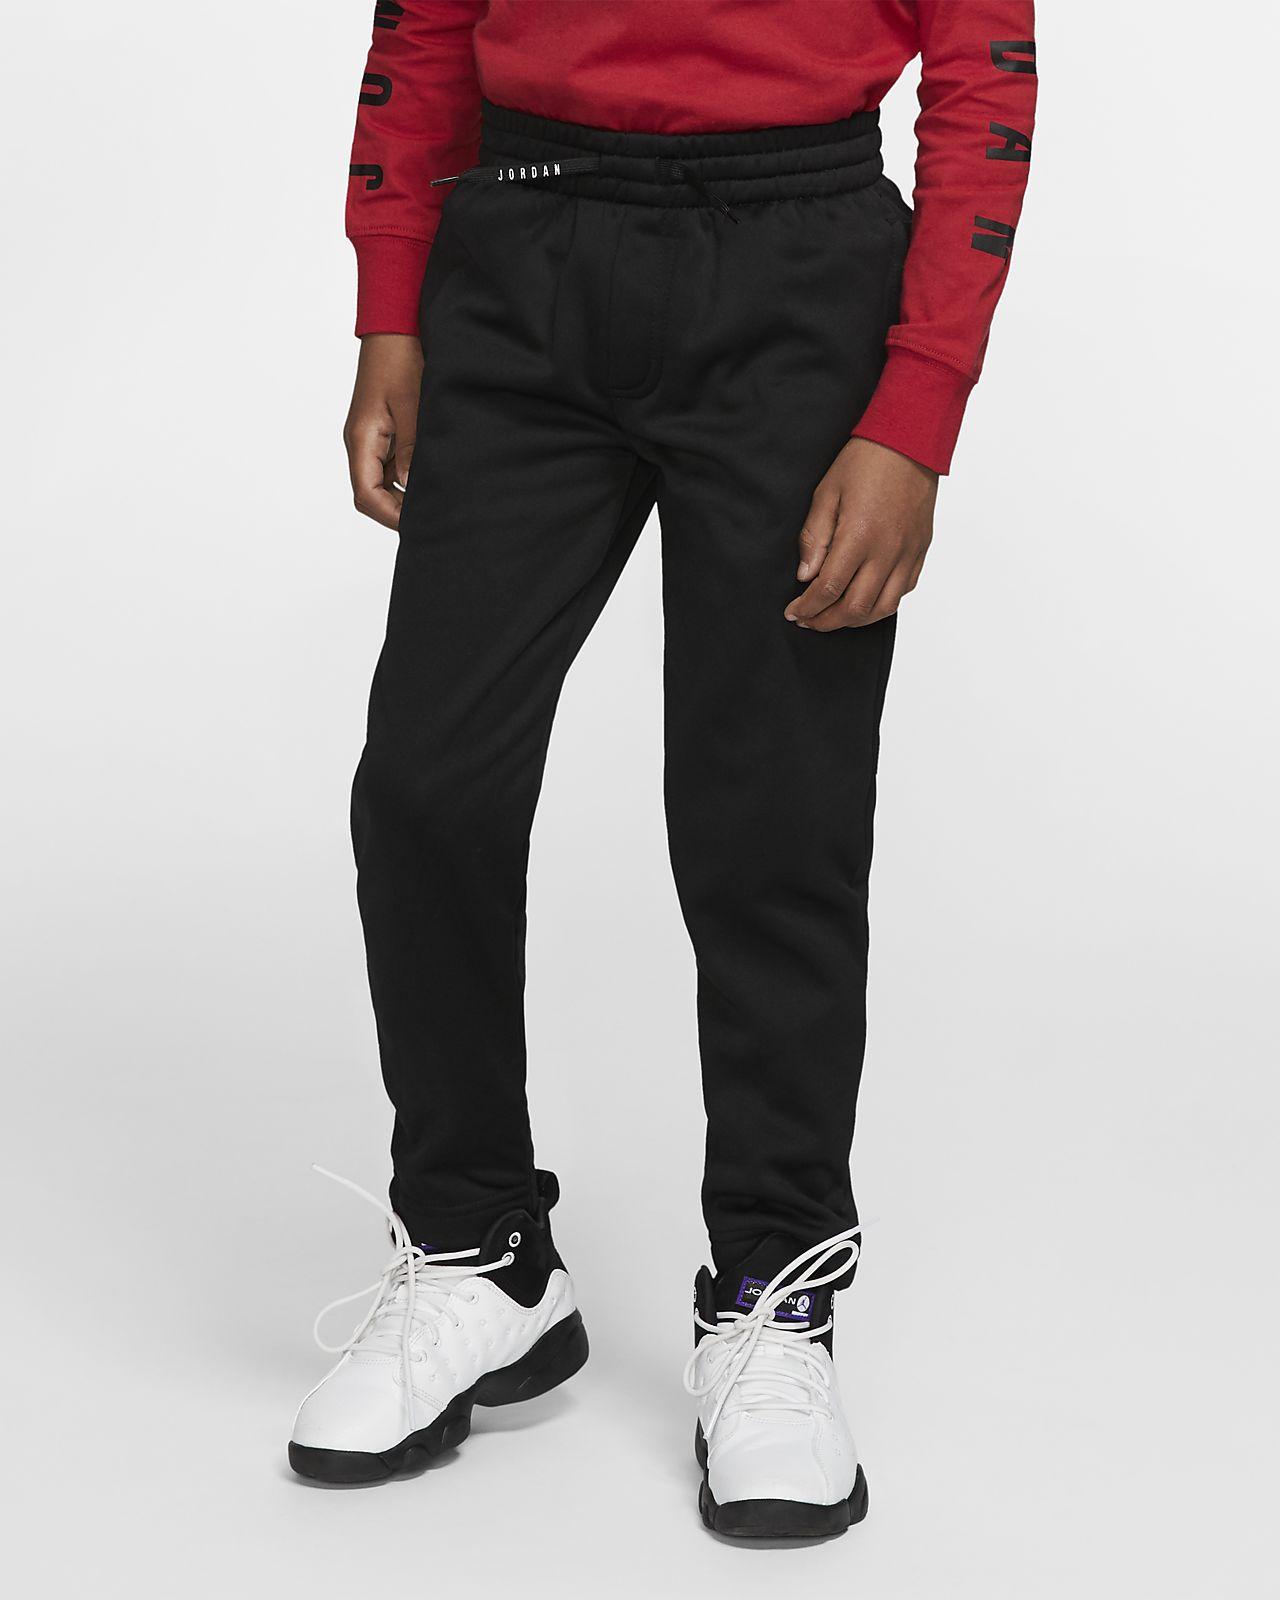 fbe442a4265 Jordan 23 Alpha Therma Little Kids' (Boys') Pants. Nike.com